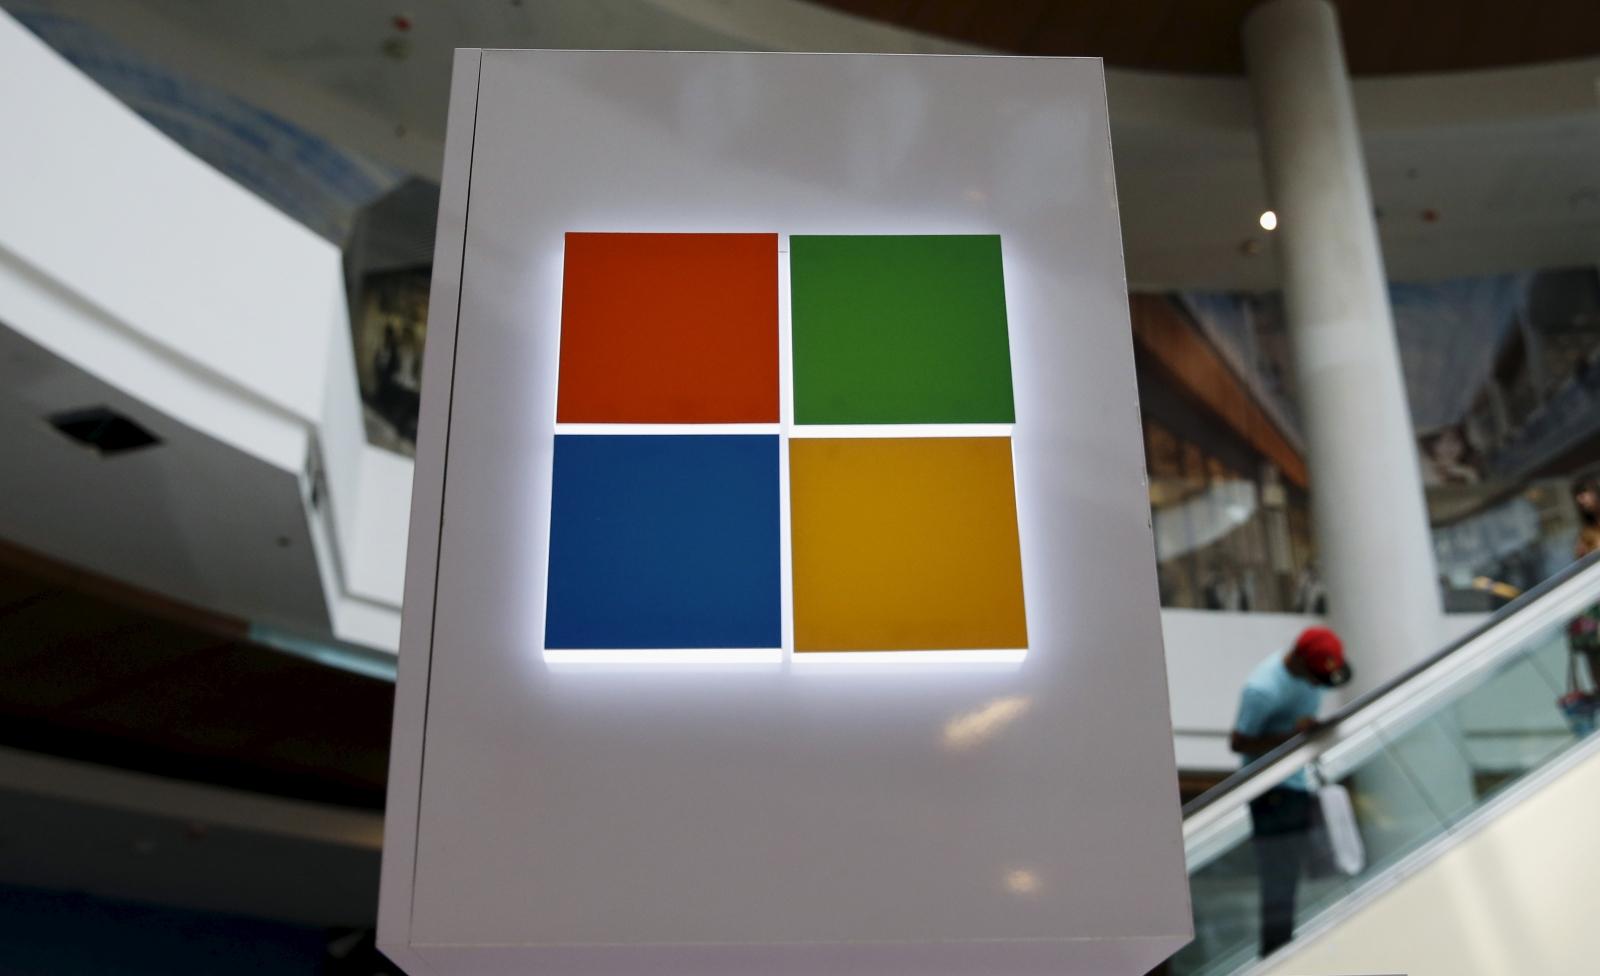 Microsoft joins $5.3 billion Informatica